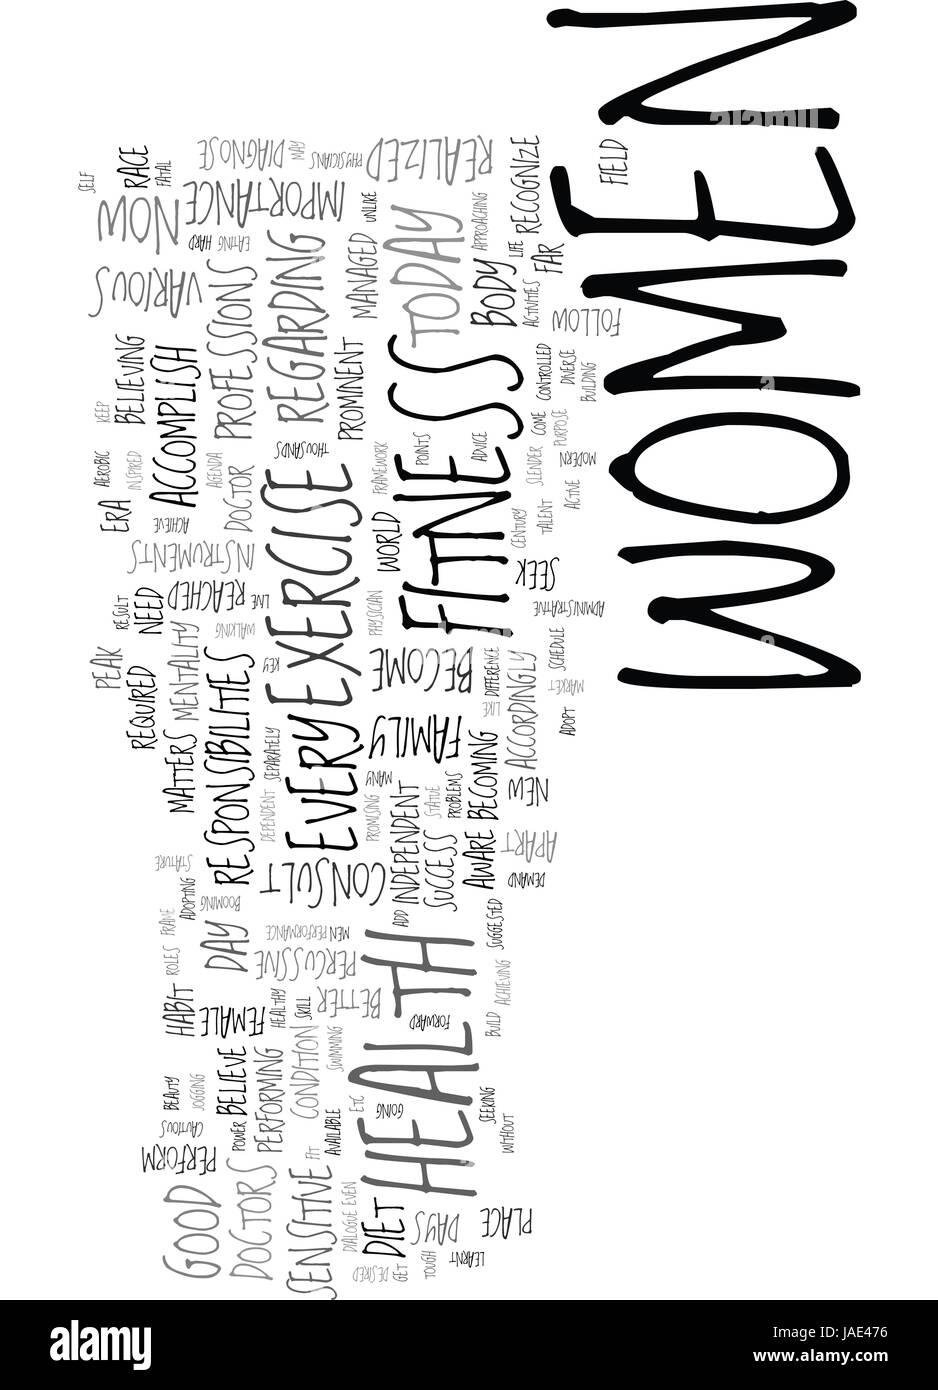 WOMEN OF MODERN ERA TEXT WORD CLOUD CONCEPT - Stock Image